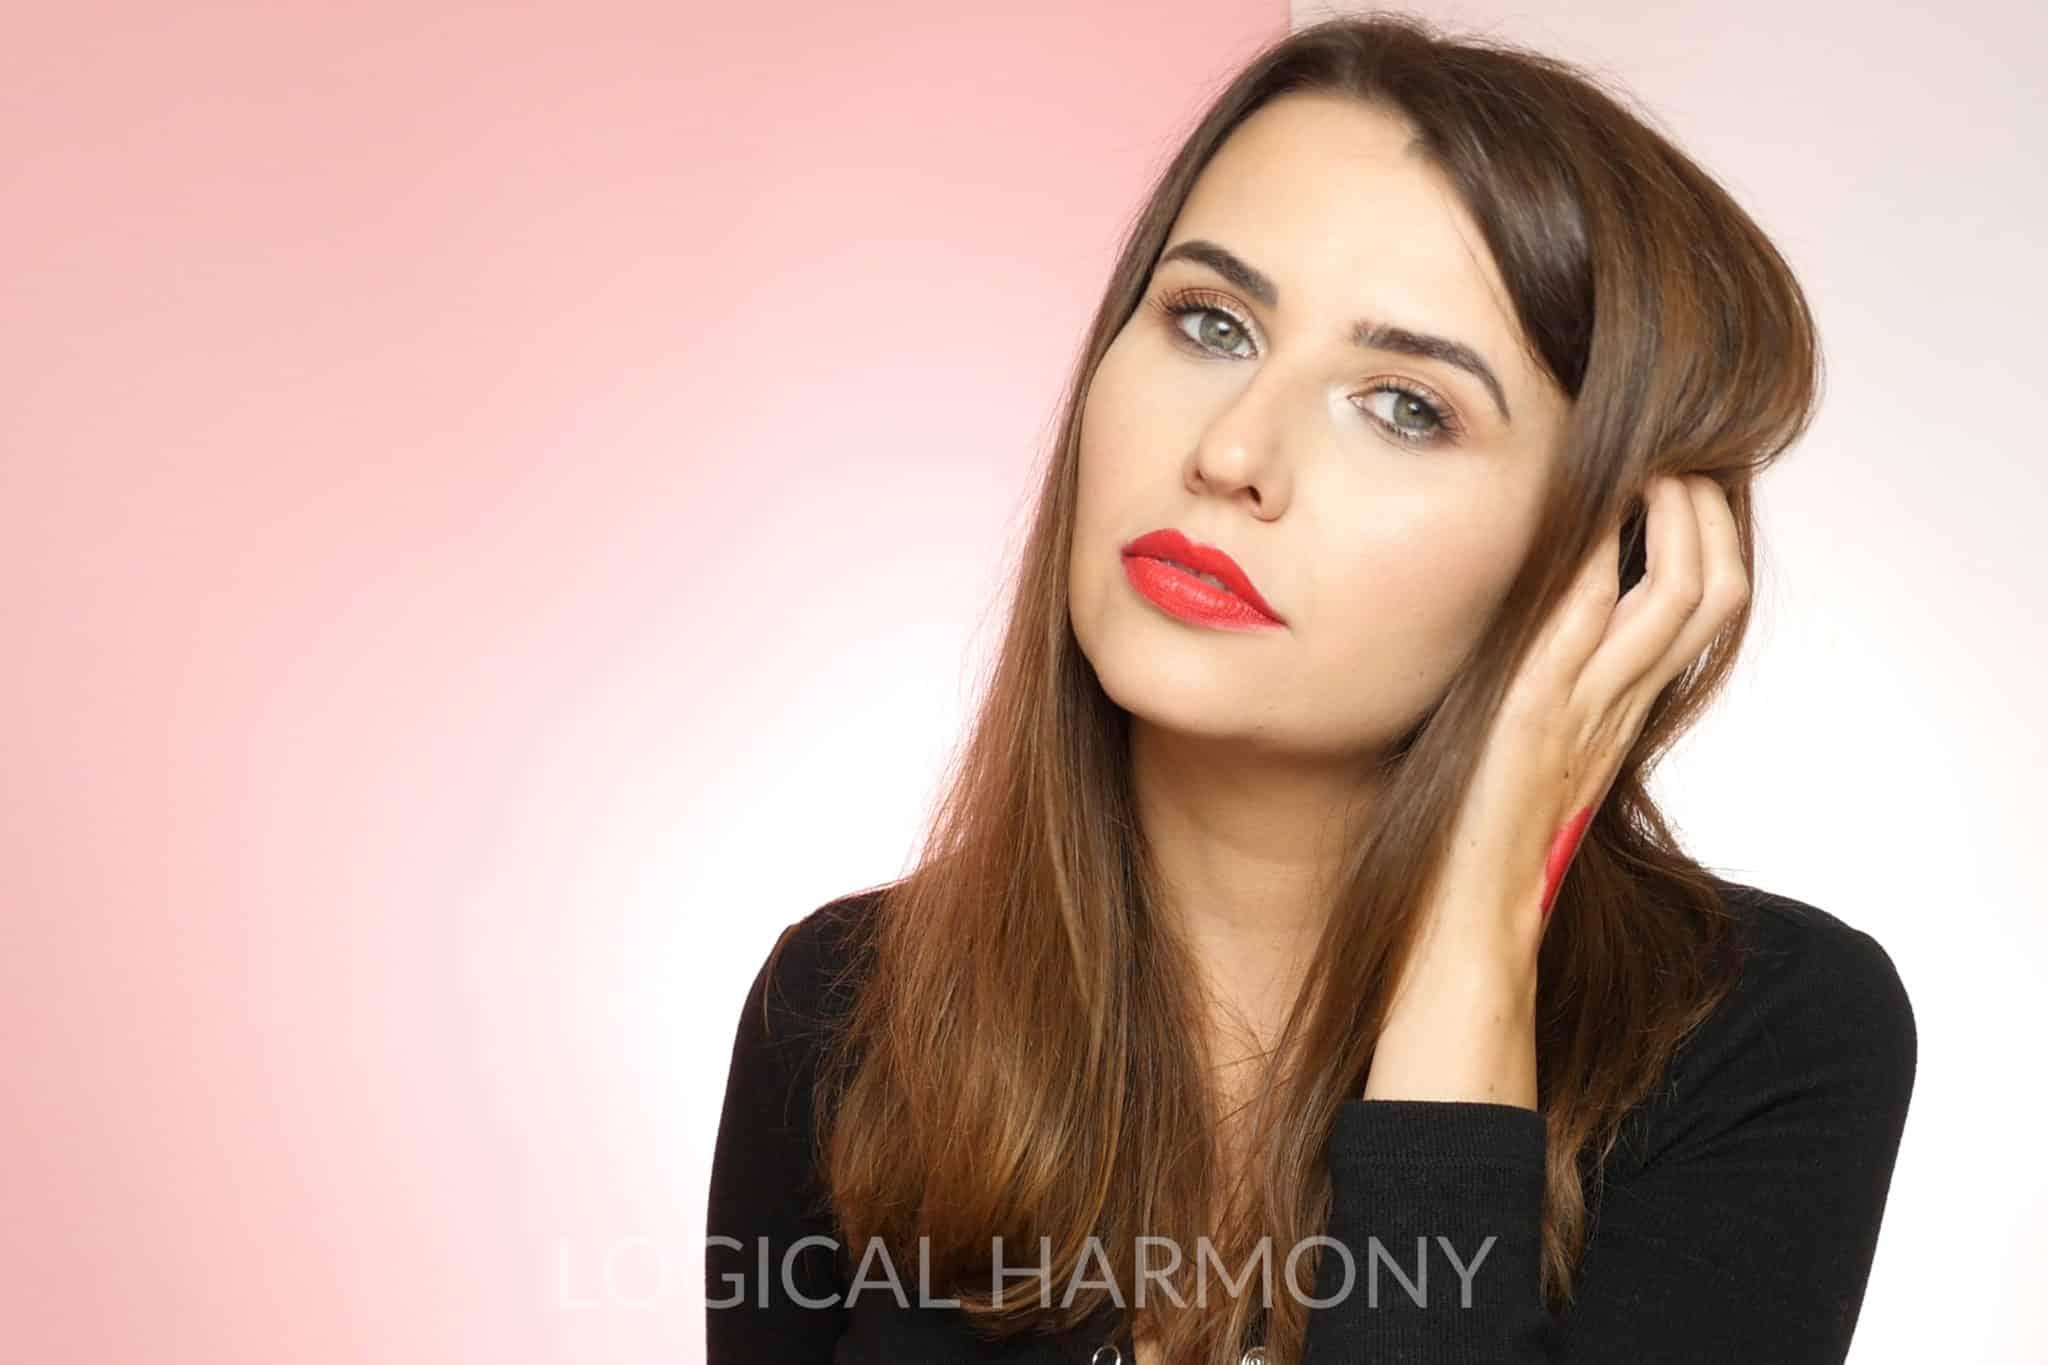 NCLA Beauty Lipstick Calabasas Queen